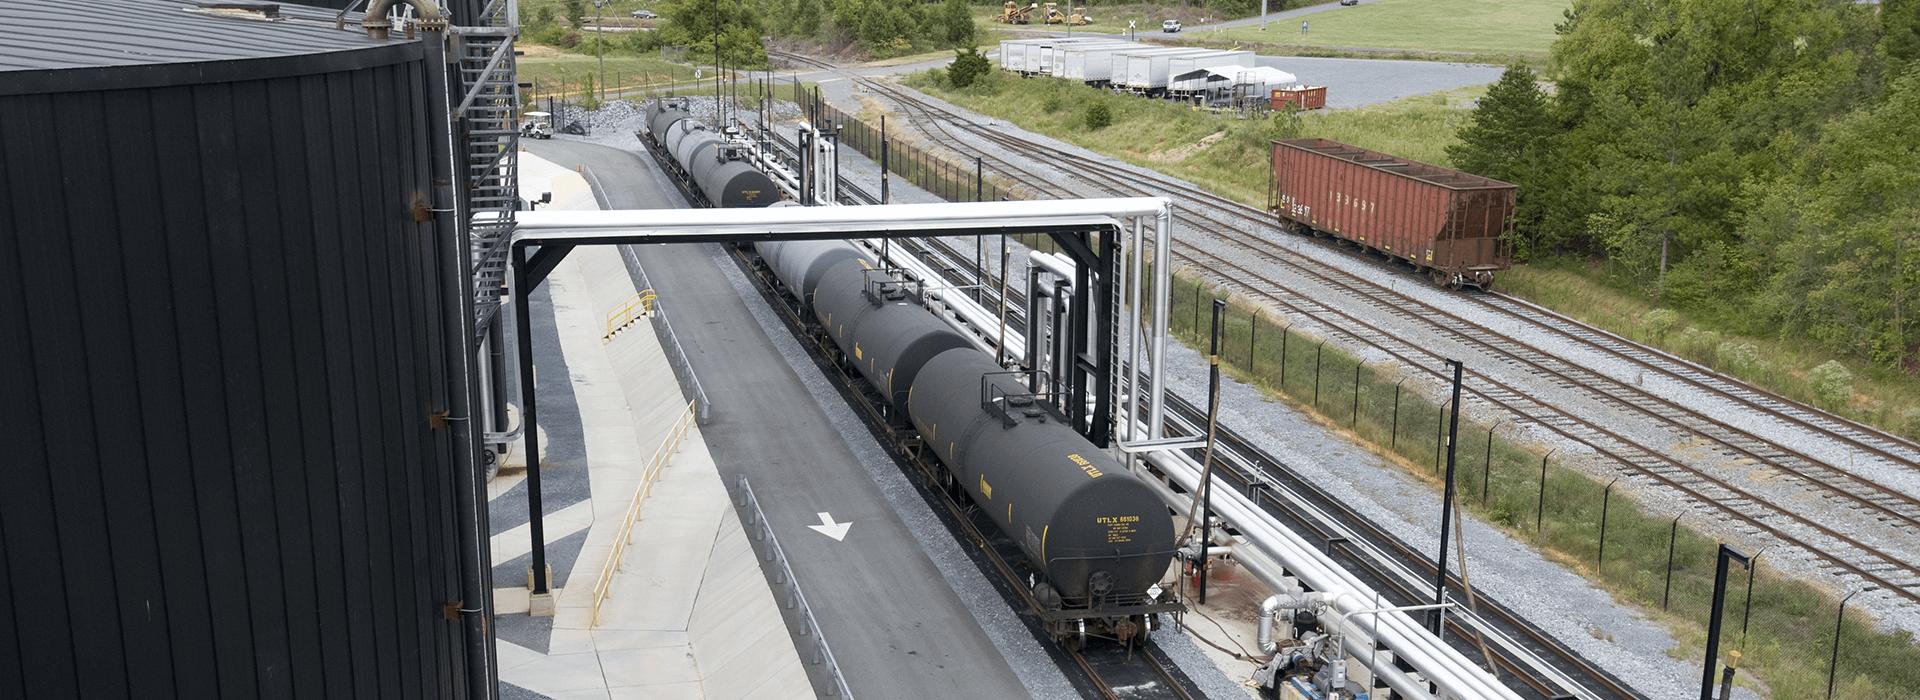 Heatec Rail Car Unloading System